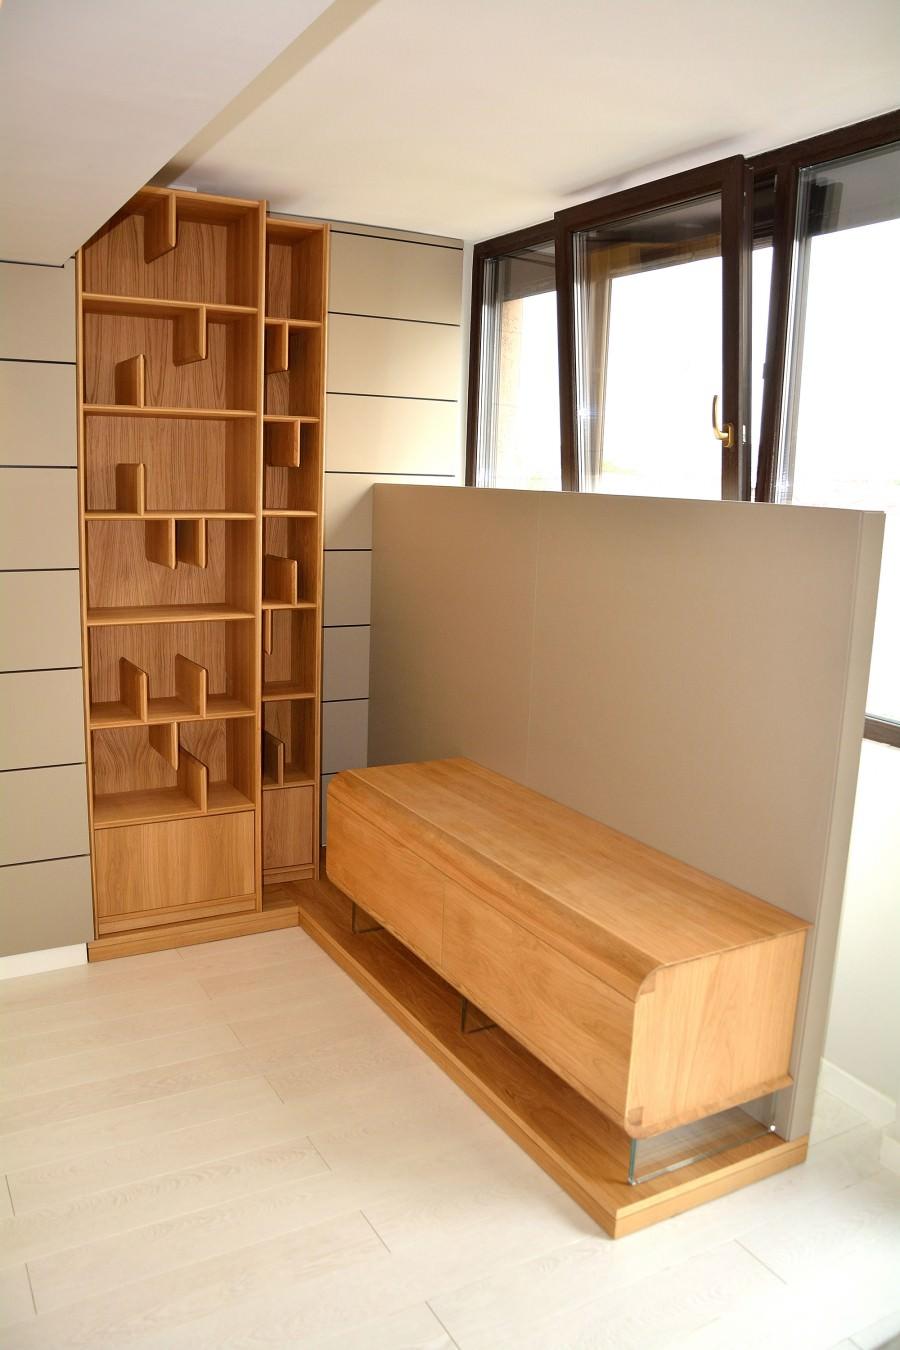 Living realizat modern din placari pereti mdf vopsit gri cu mobilier lemn masiv natural din stejar masiv 900x1350 3